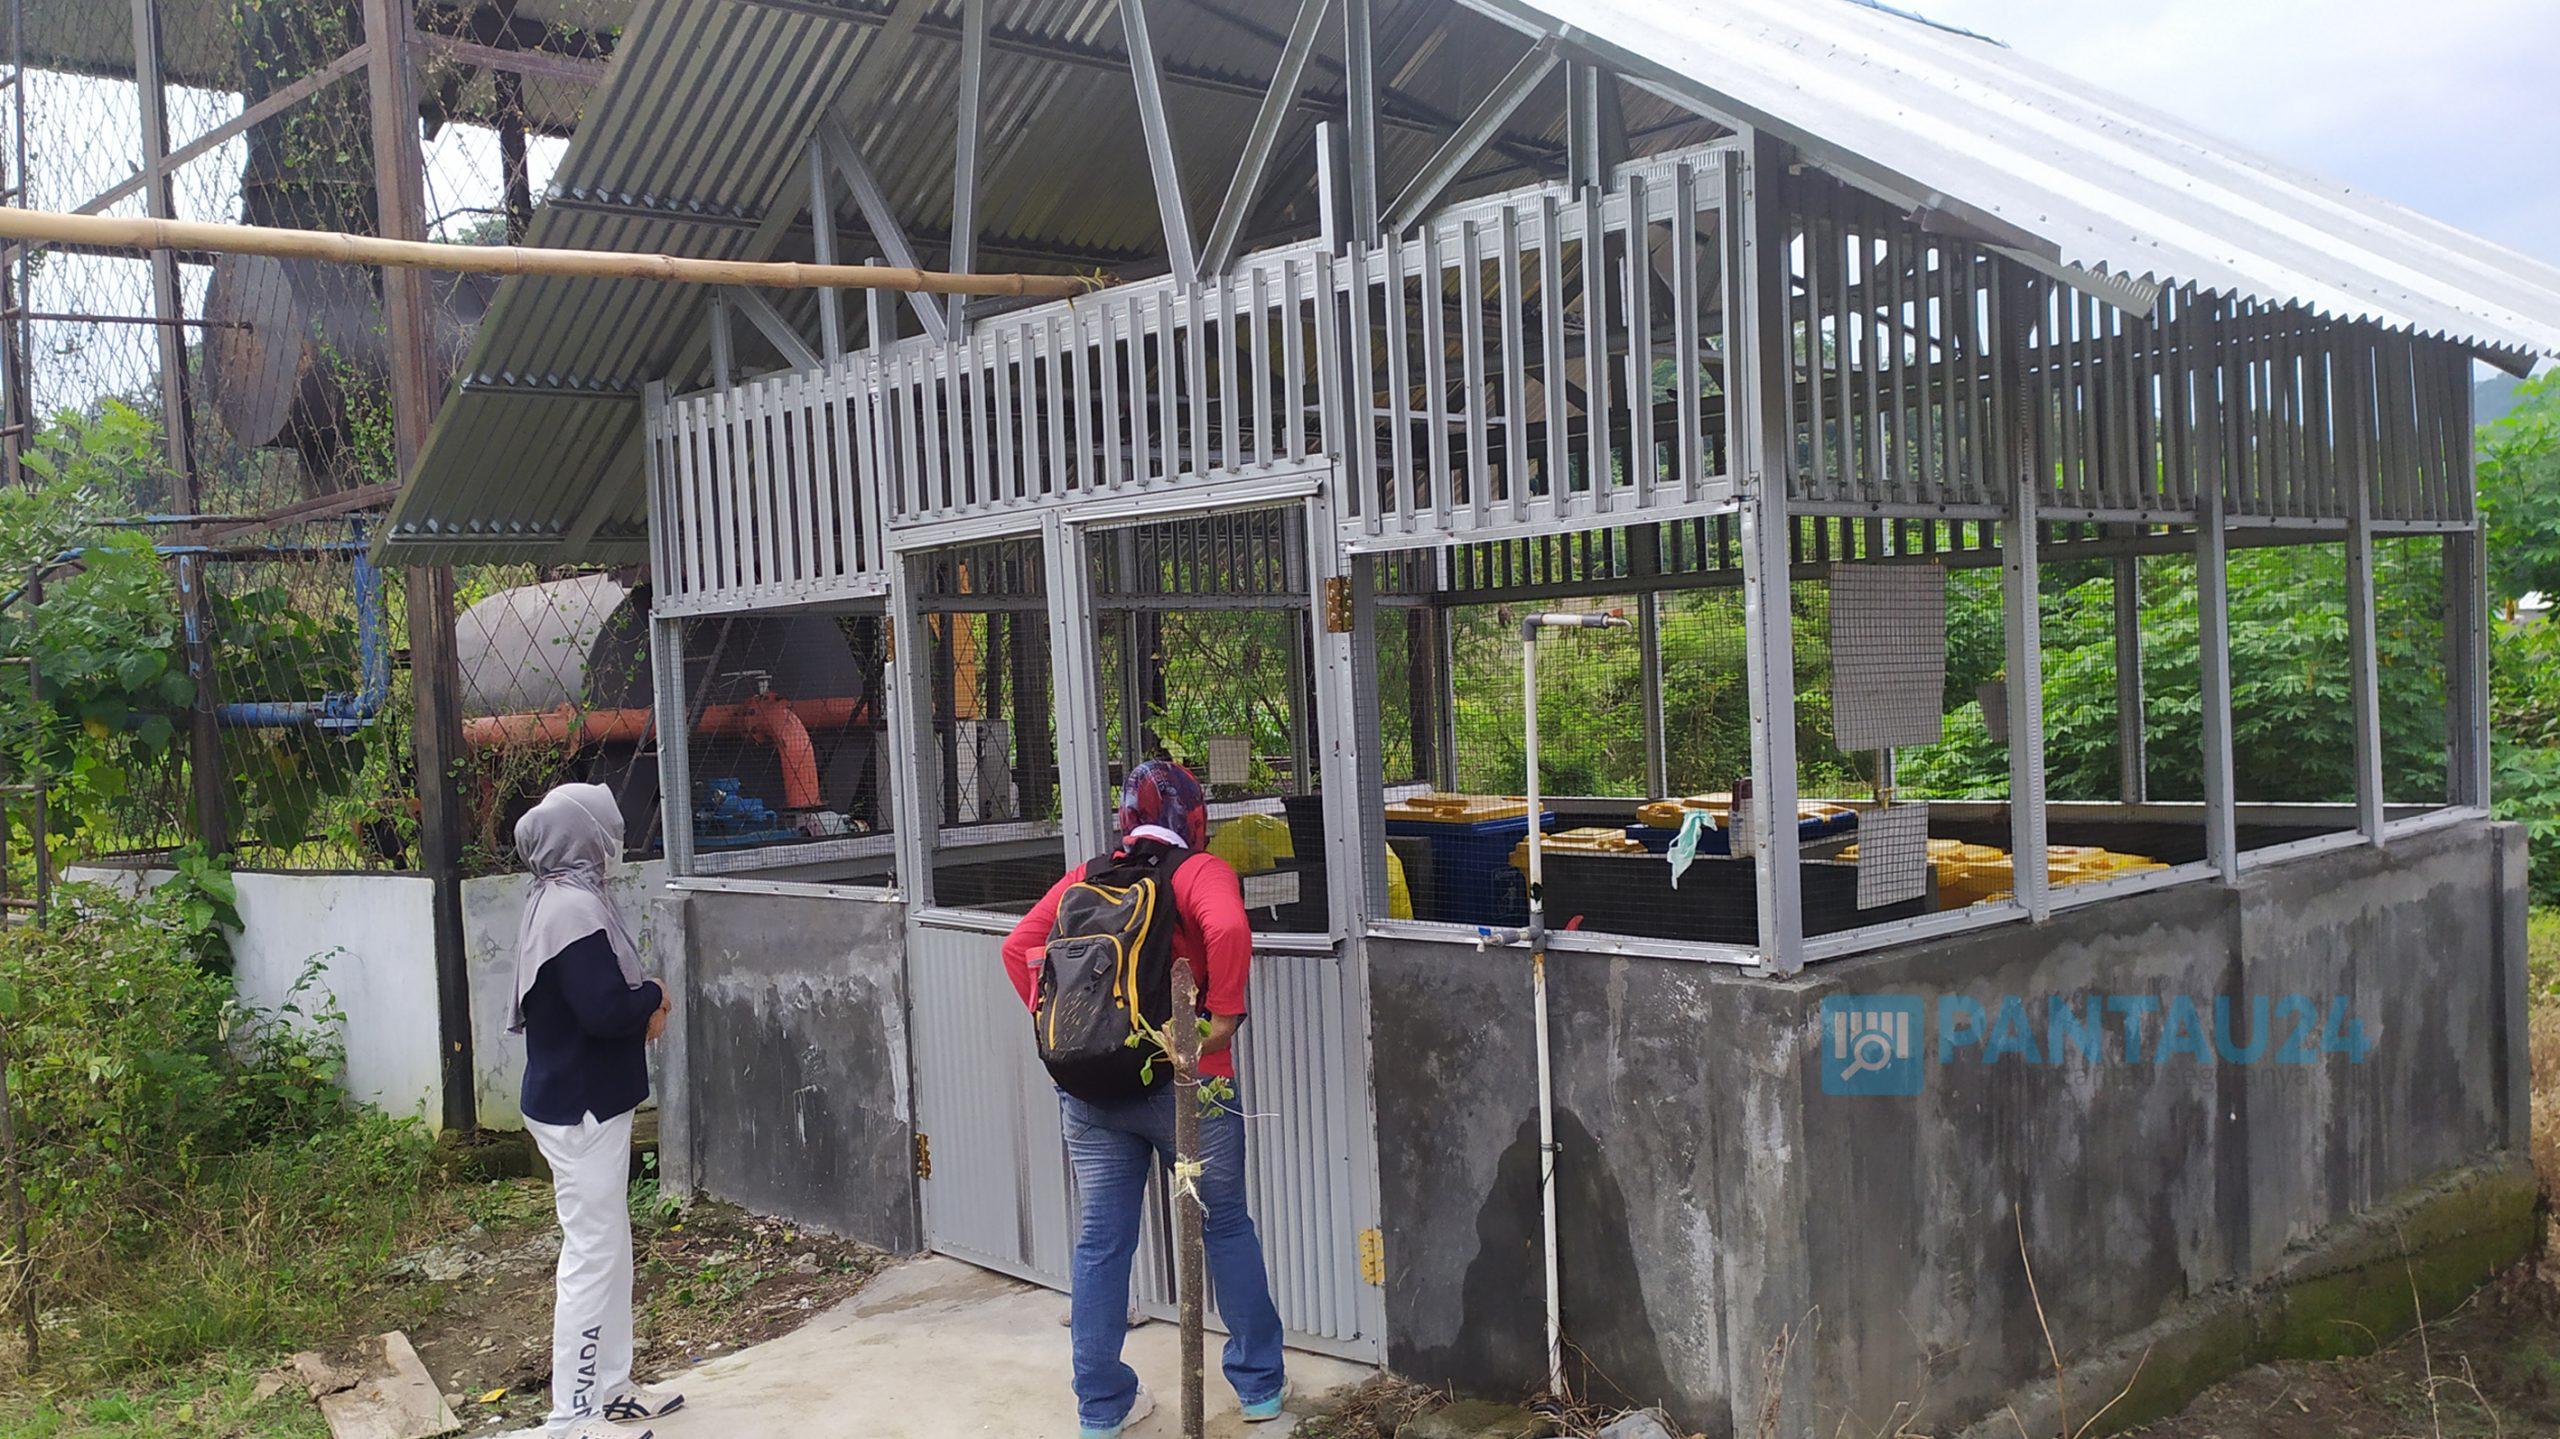 Tempat penyimpanan sementara limbah medis RSUD Bolmong